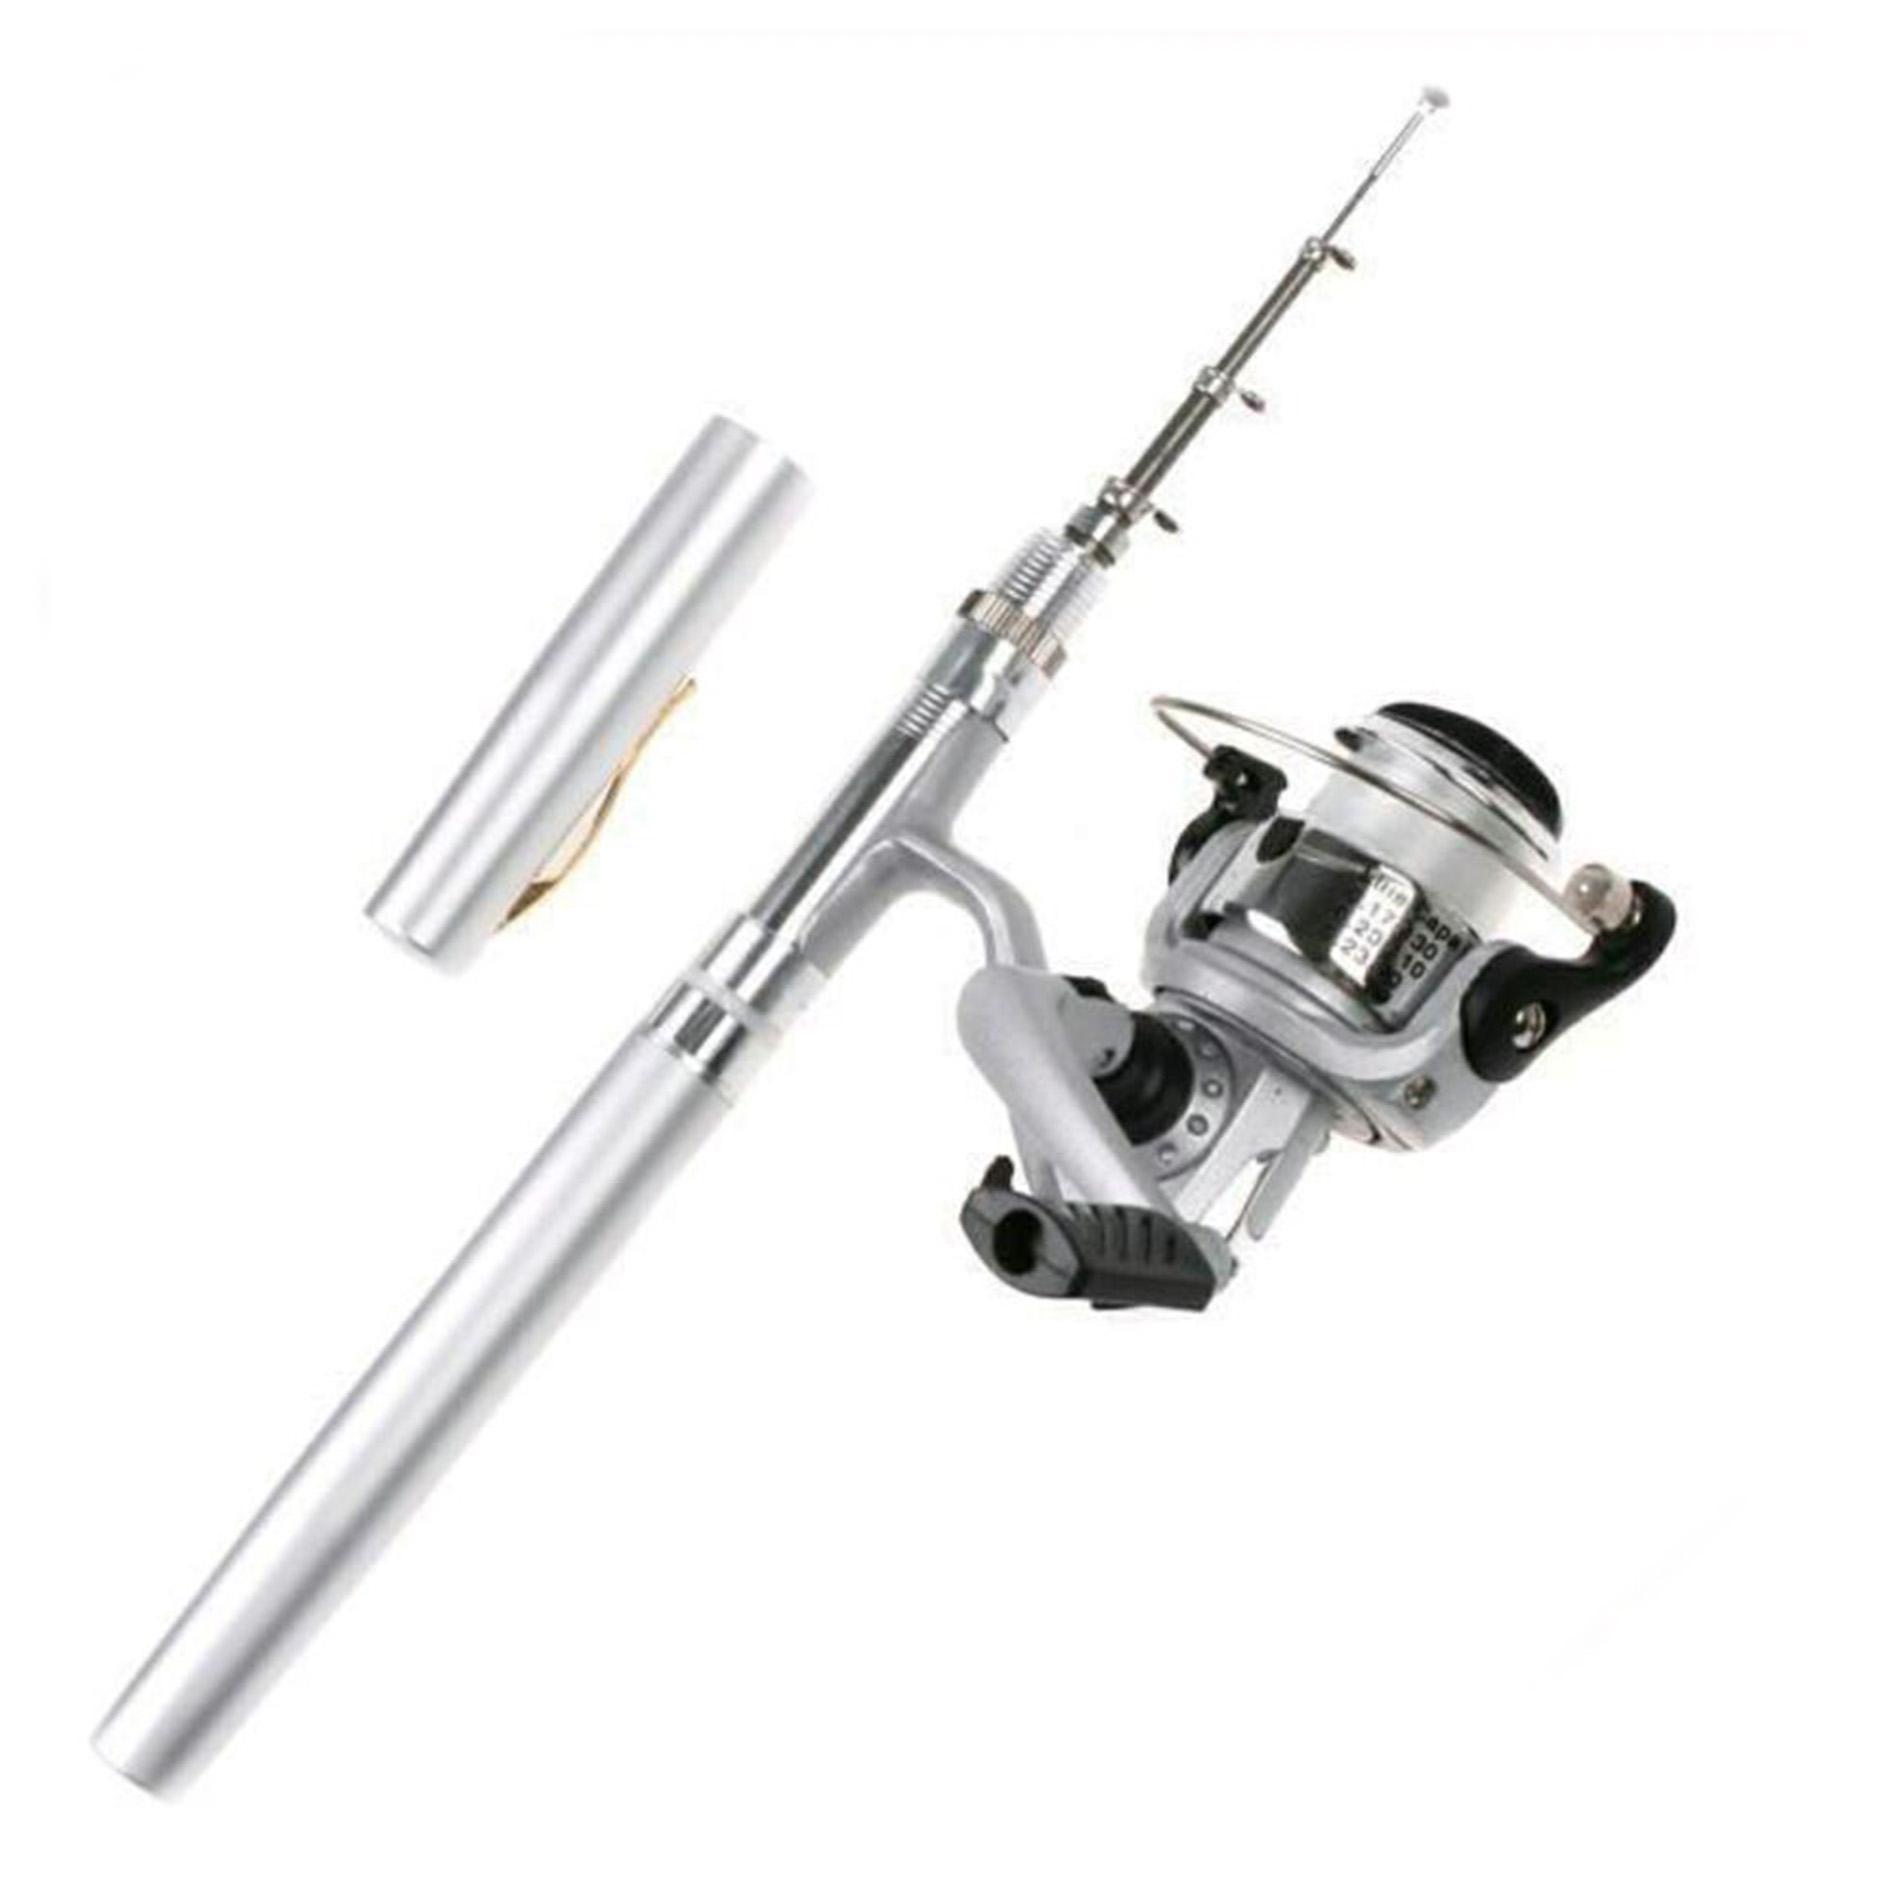 Jual Pena Walesan Joran Pancing 90cm Harga Rp 135000 Mini Portable Extreme Pen Fishing Rod Length 1m